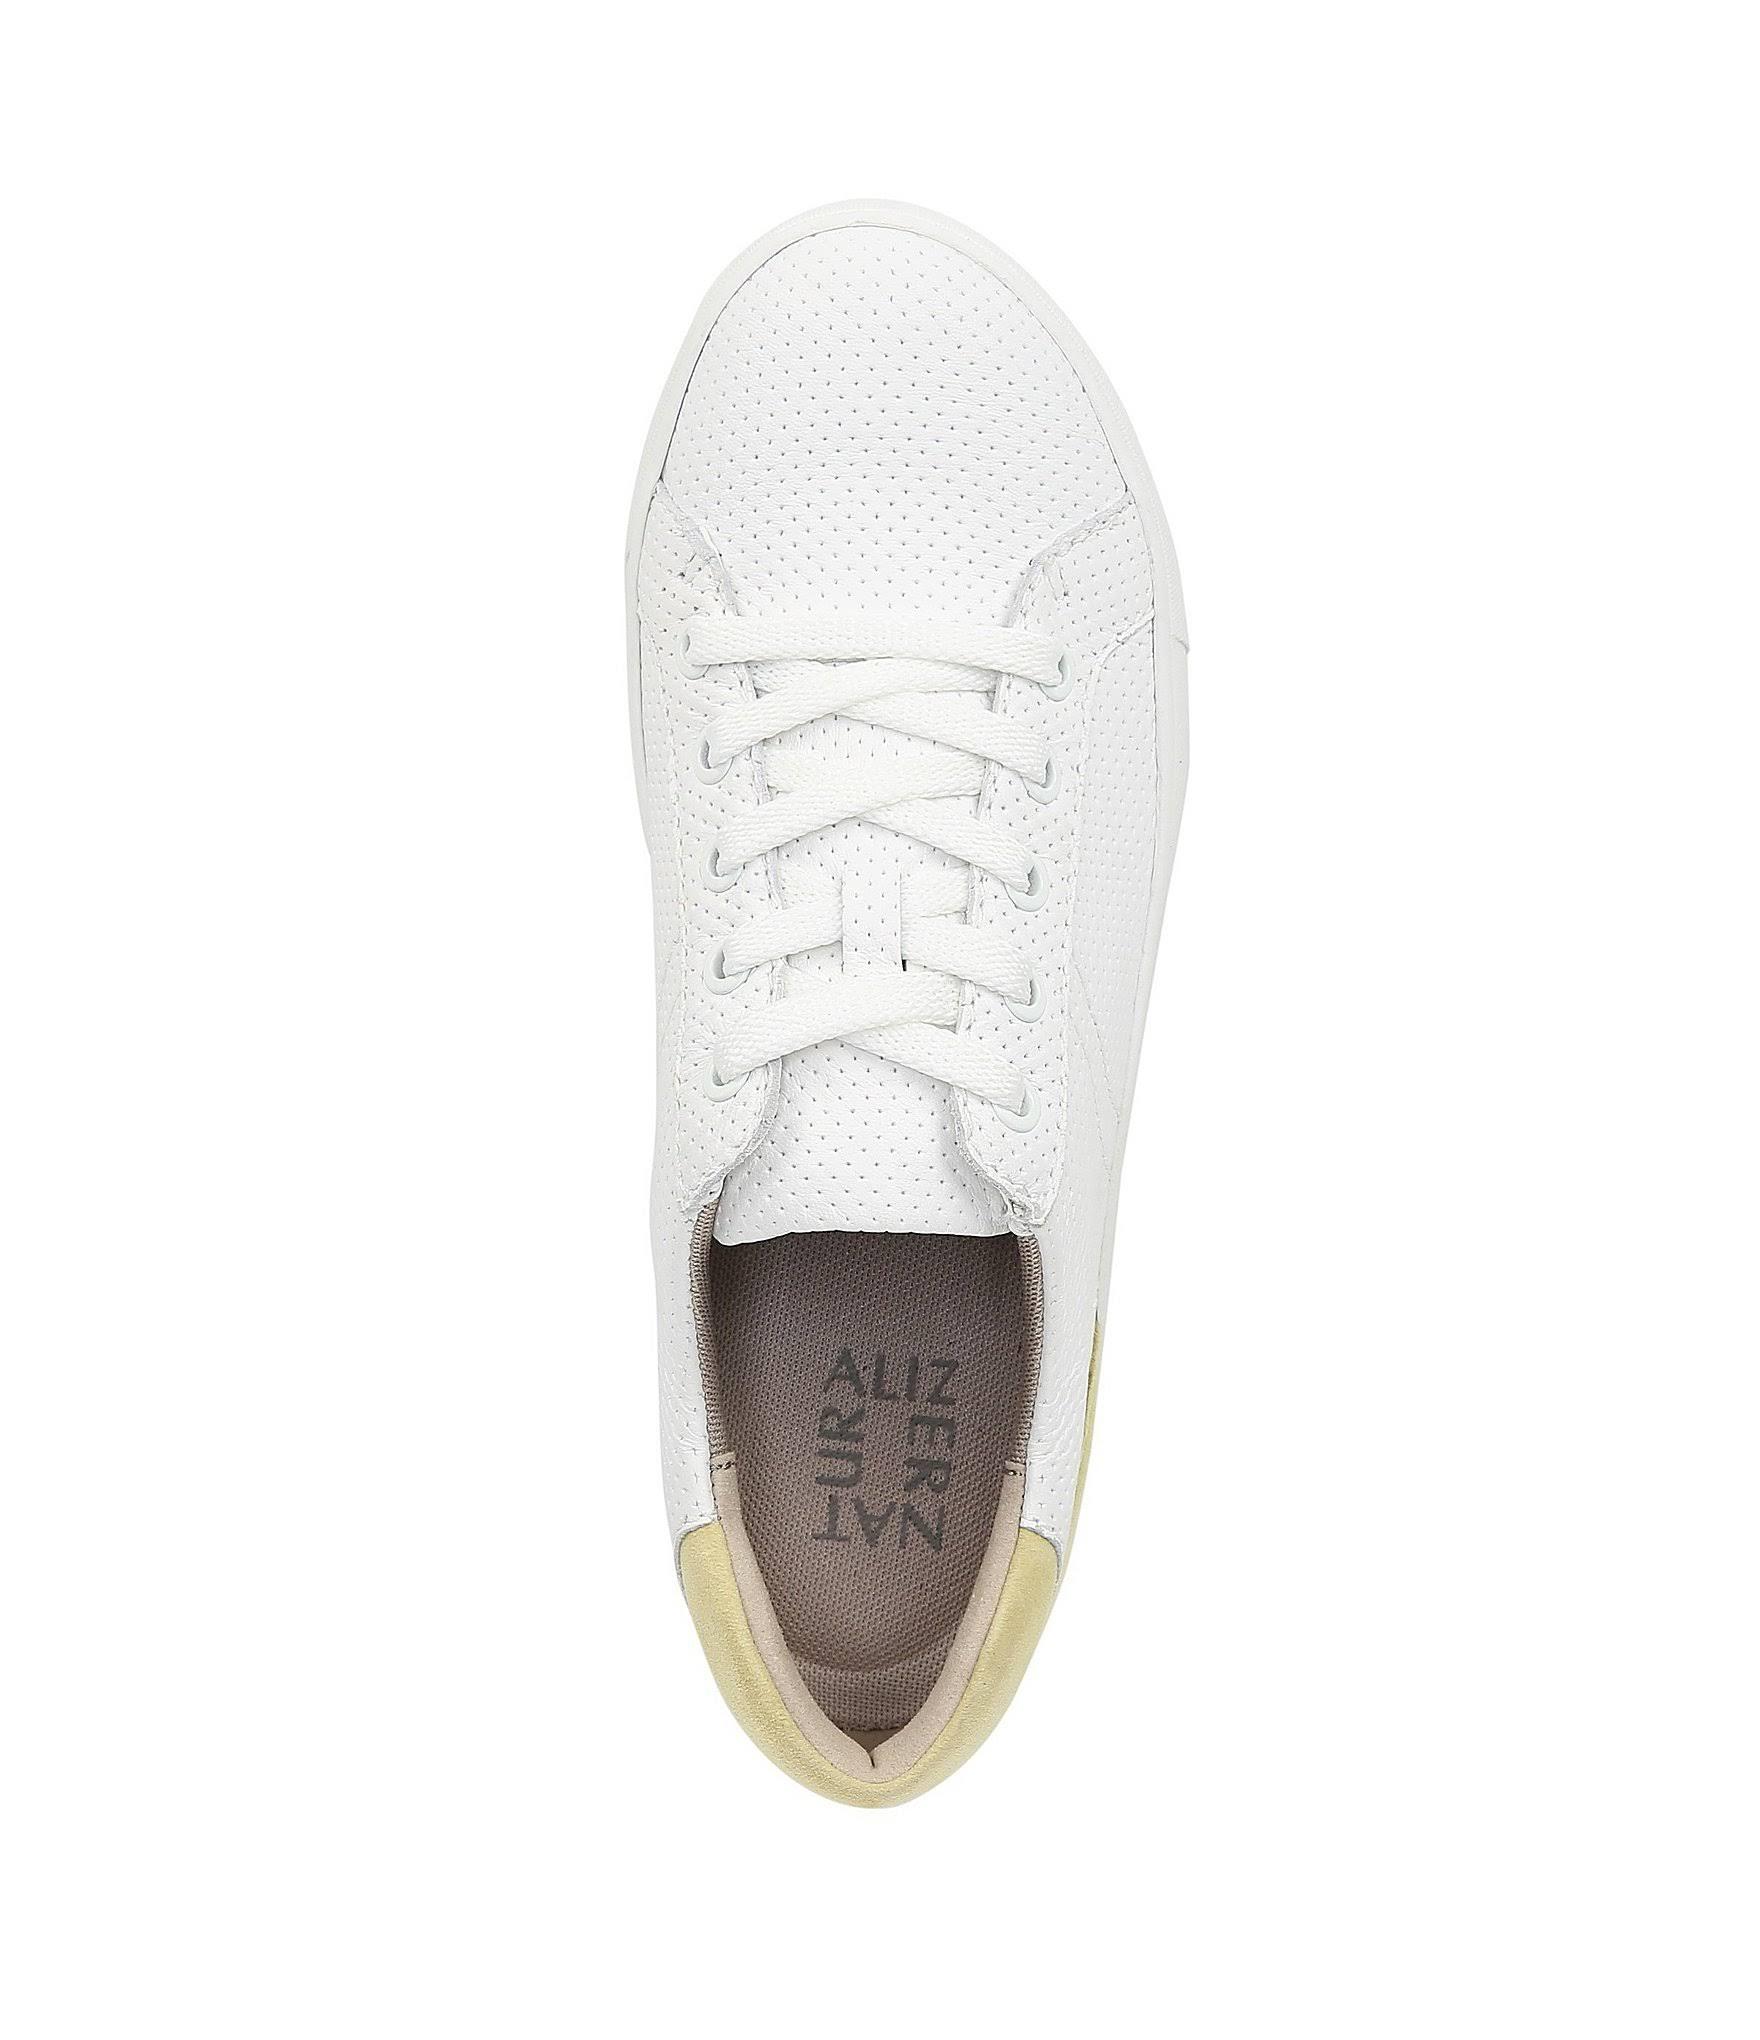 9 White MorrisonWomens 5 Sneaker Medium Naturalizer DIWeEY29H